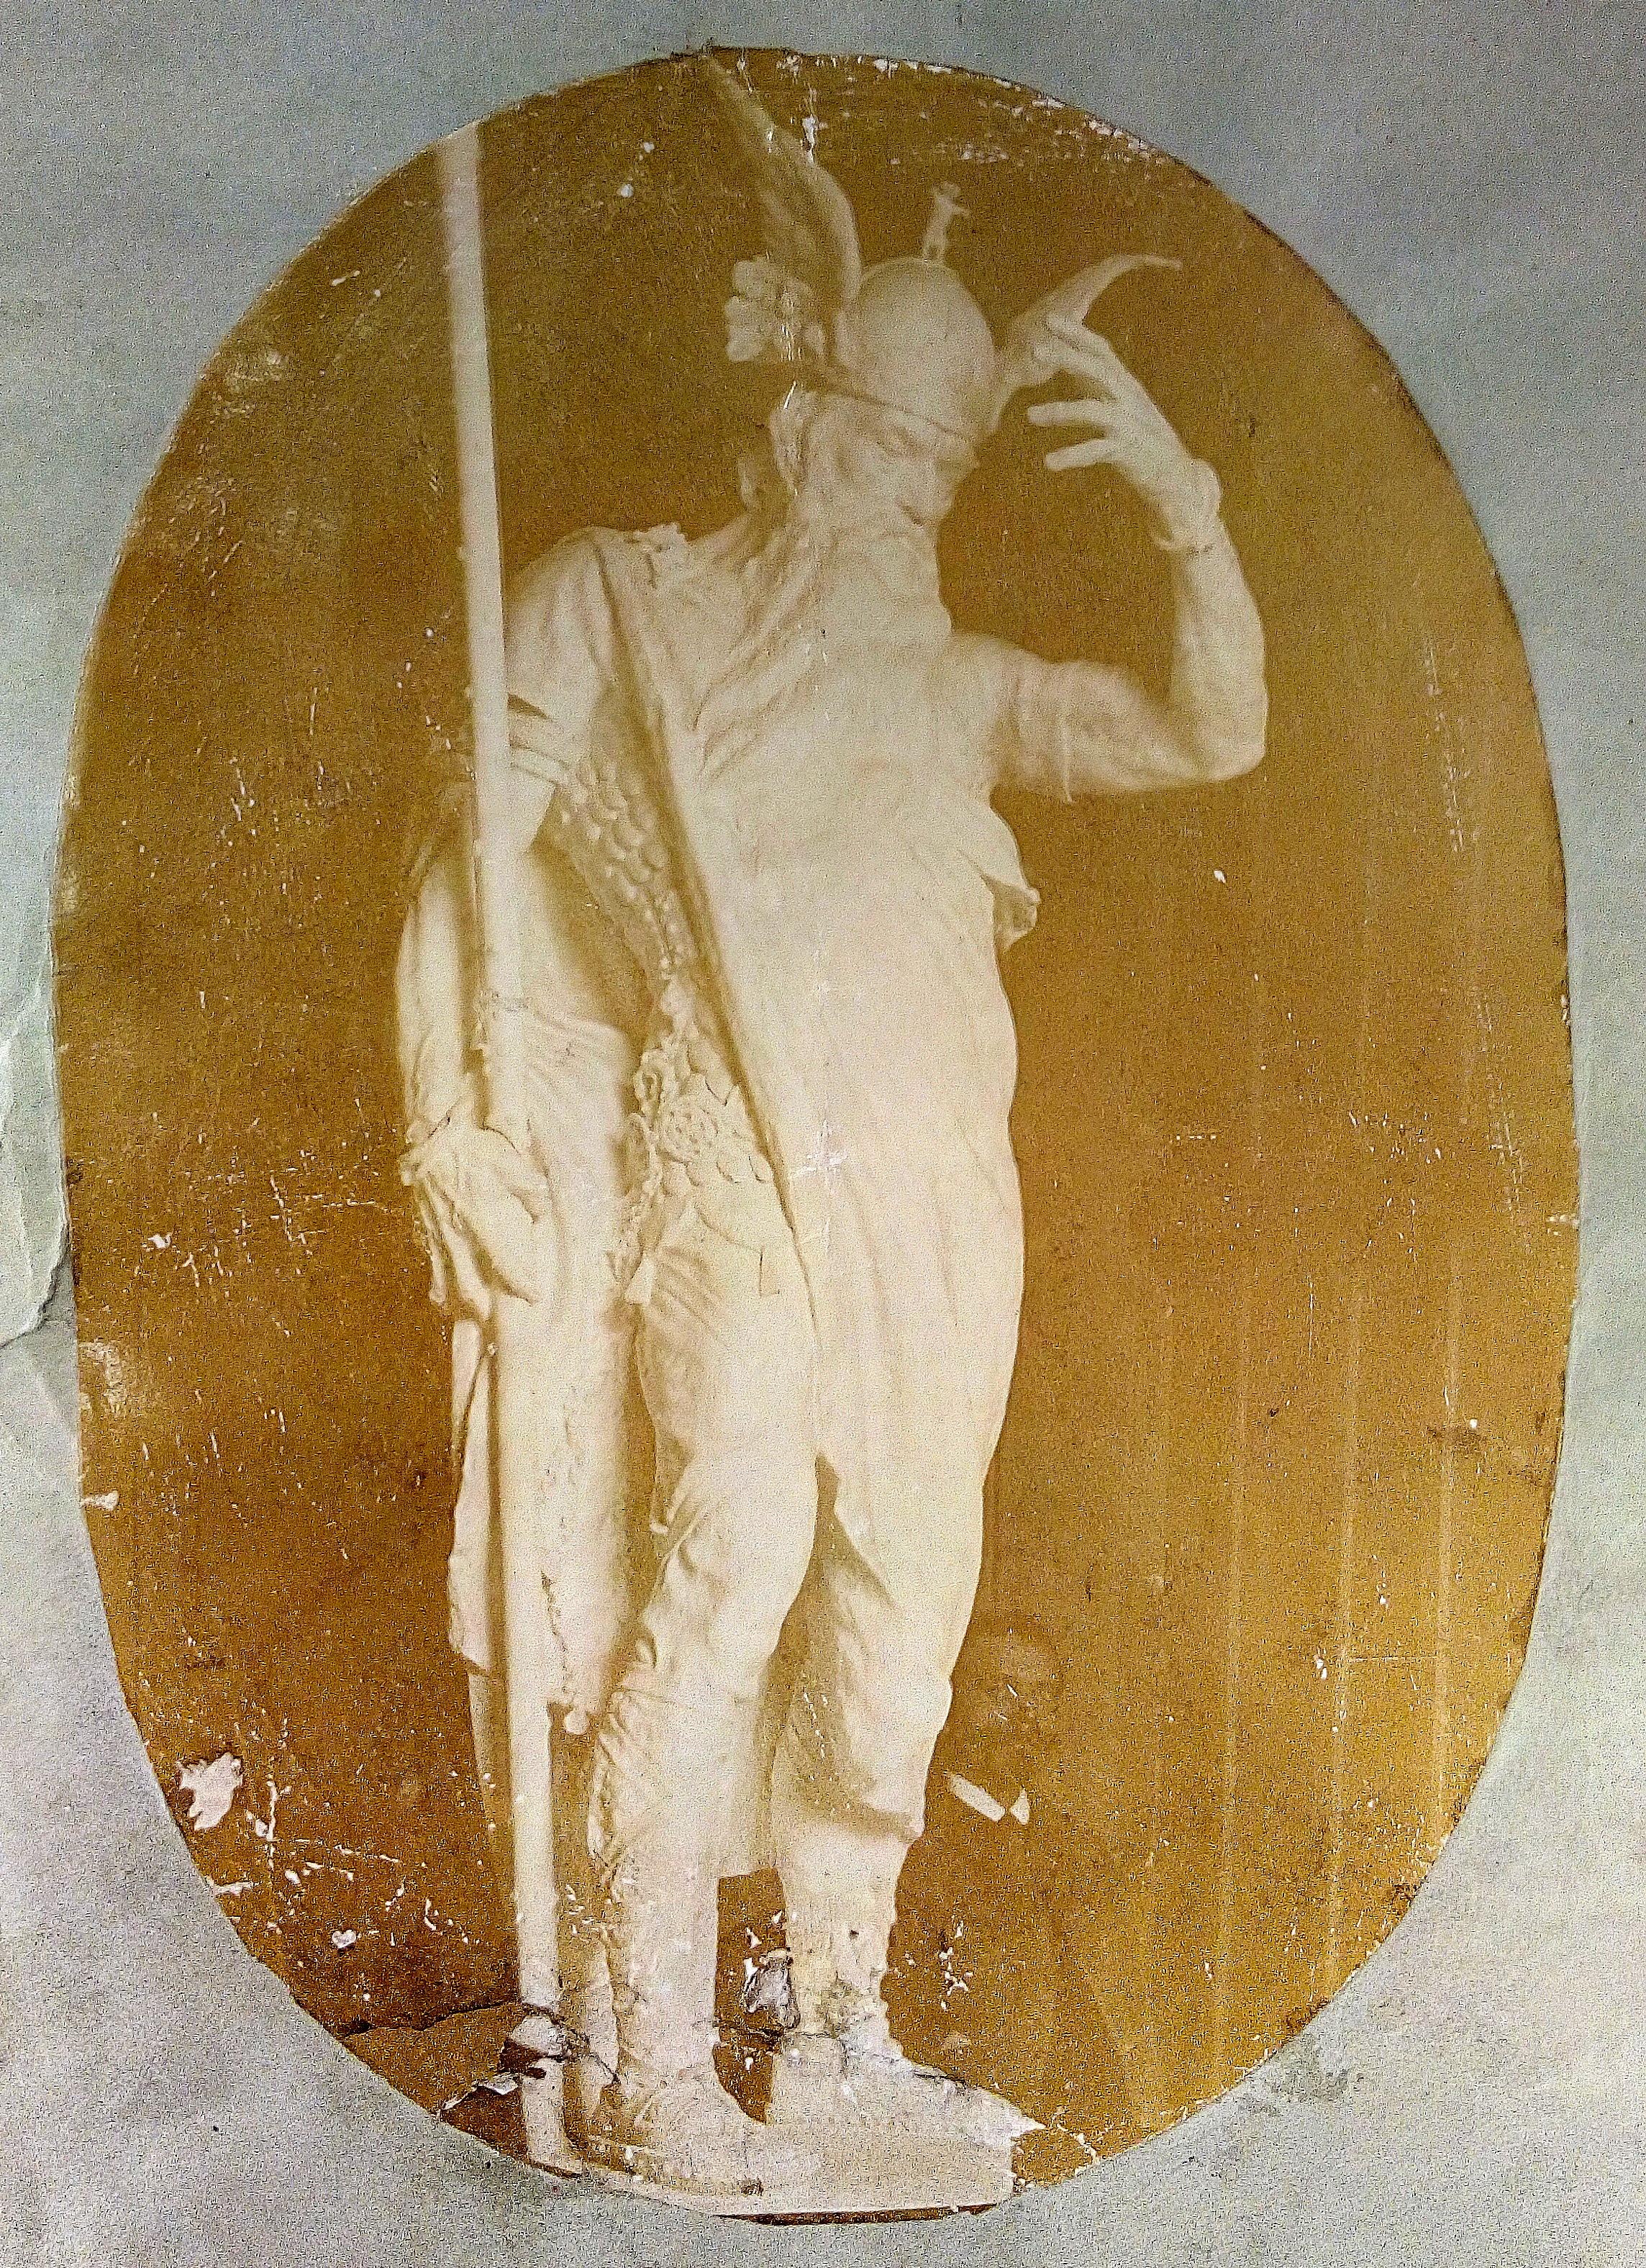 K. Wollek, Modello k soše Vannius pro Deutsches Haus, přebal rukopisu hry Guida List, König Vannius. Foto: autor